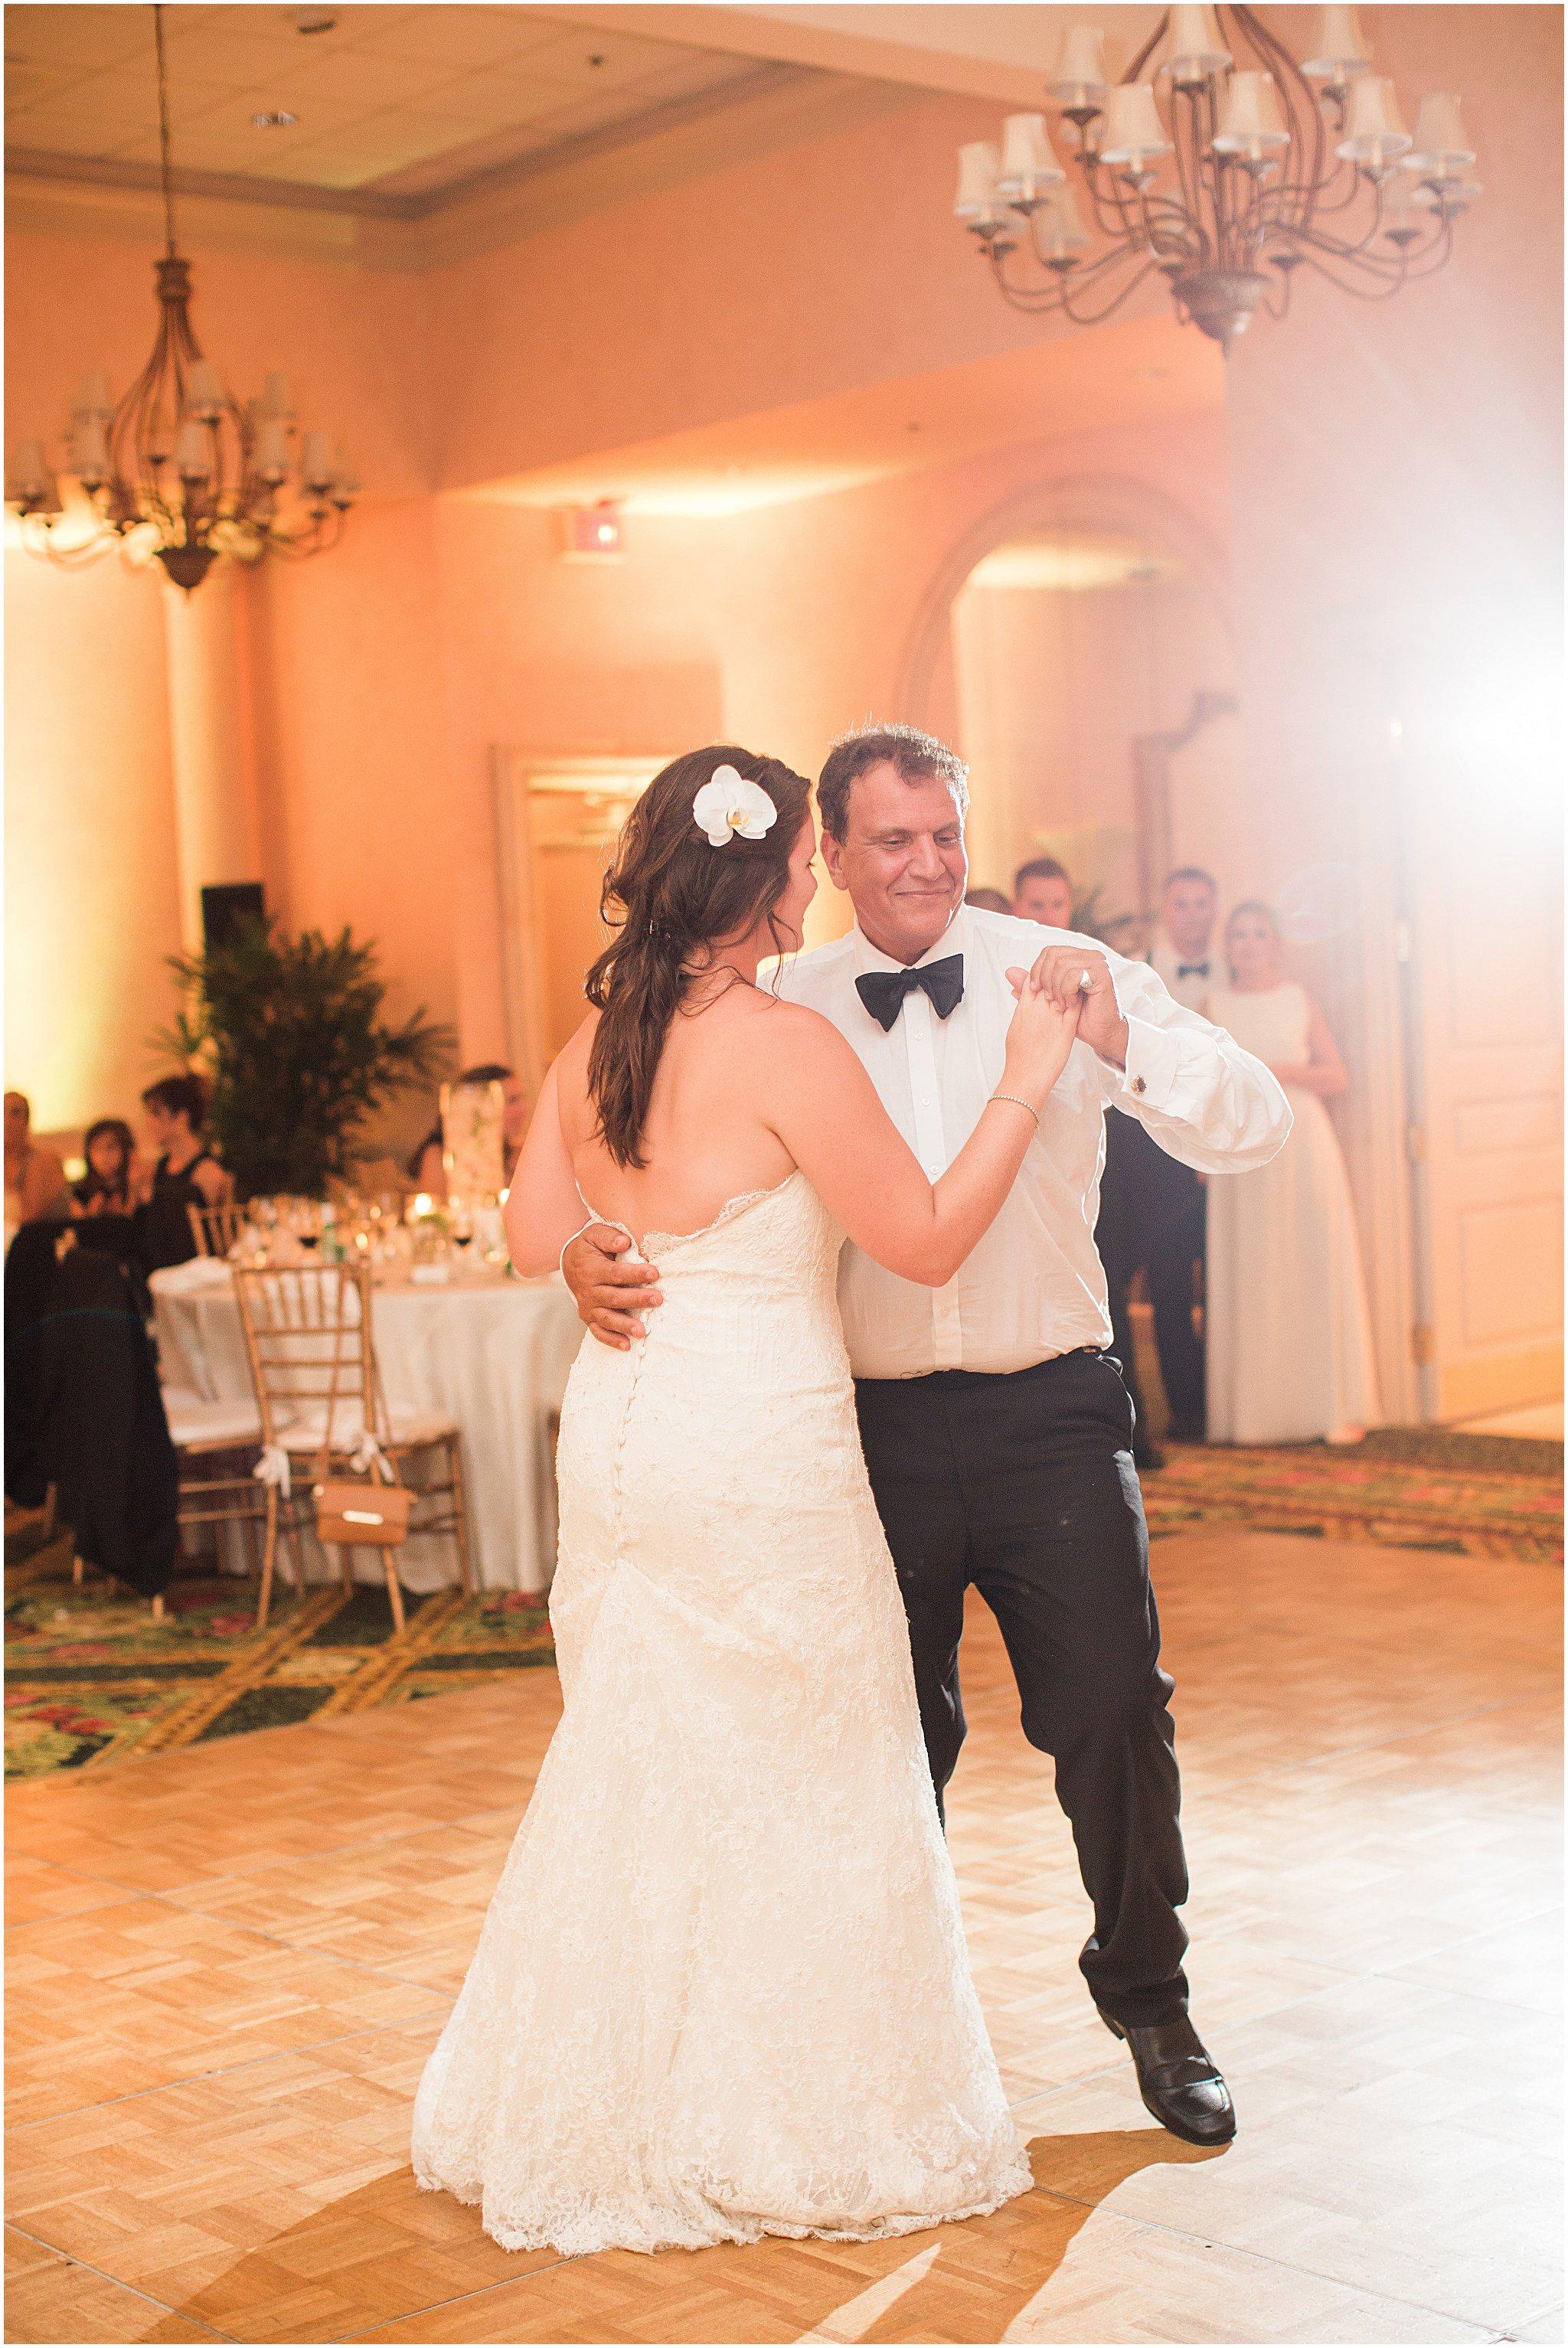 WeddingandEngagementFloridaPhotographer_1558.jpg